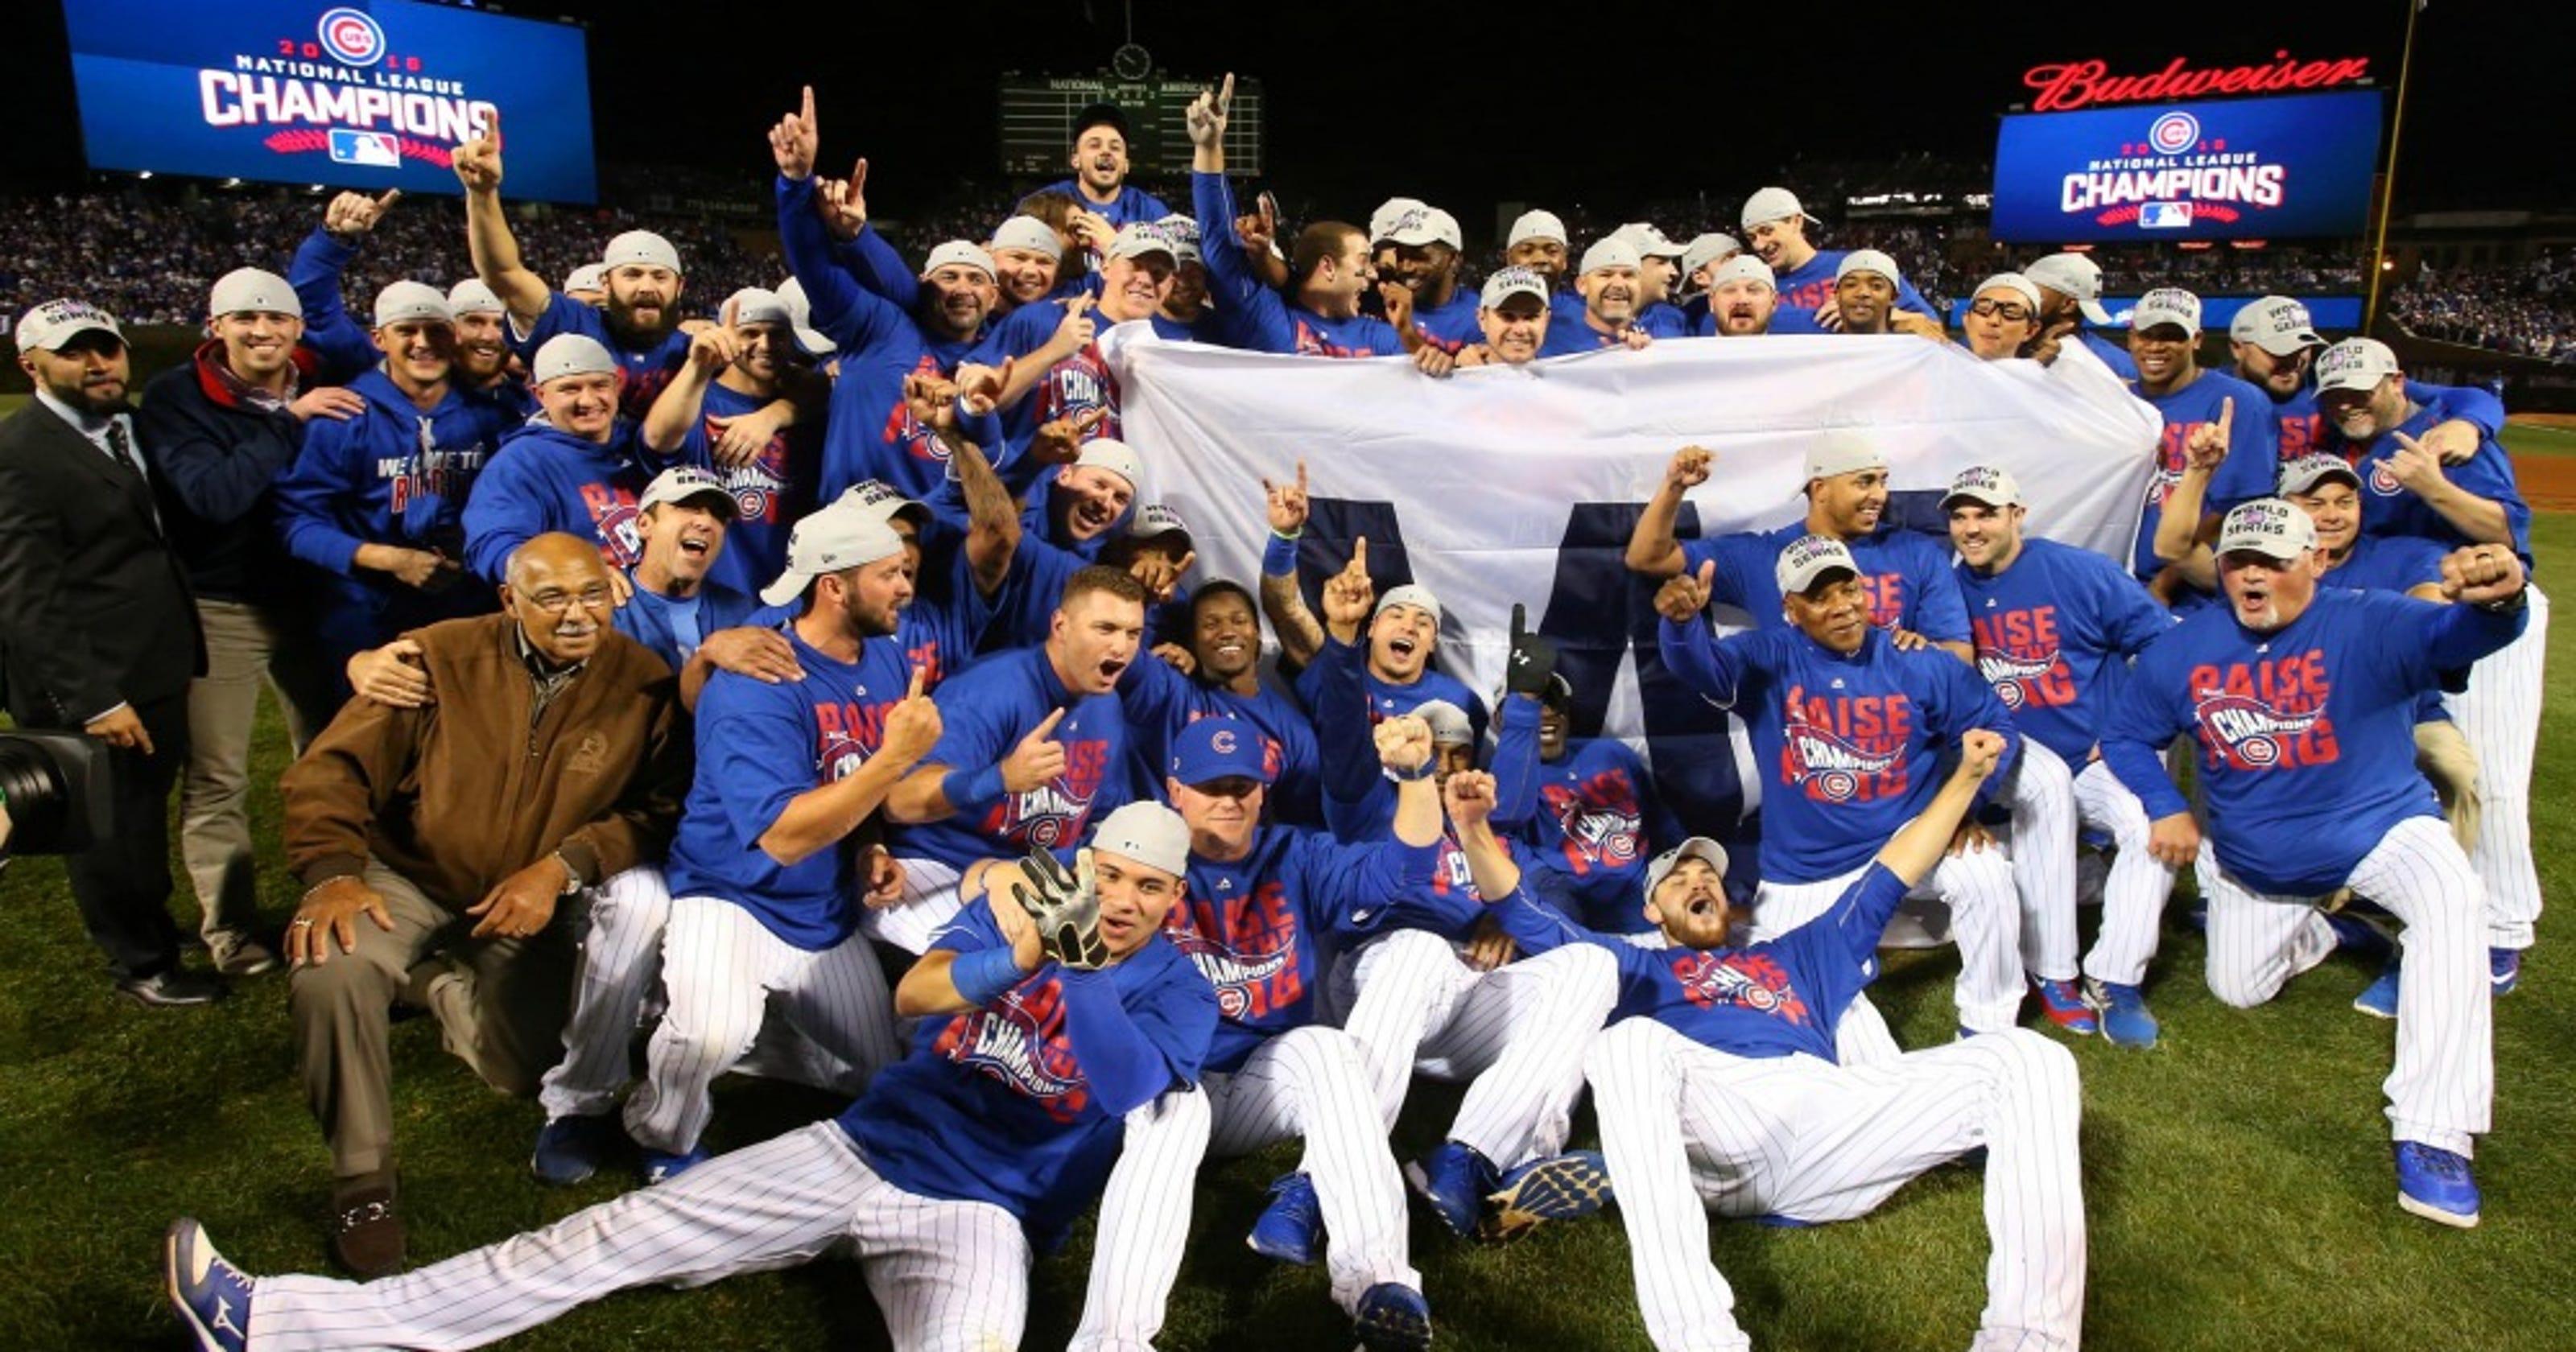 160604a2a Klapisch: Cubs set date with destiny at rocking Wrigley Field